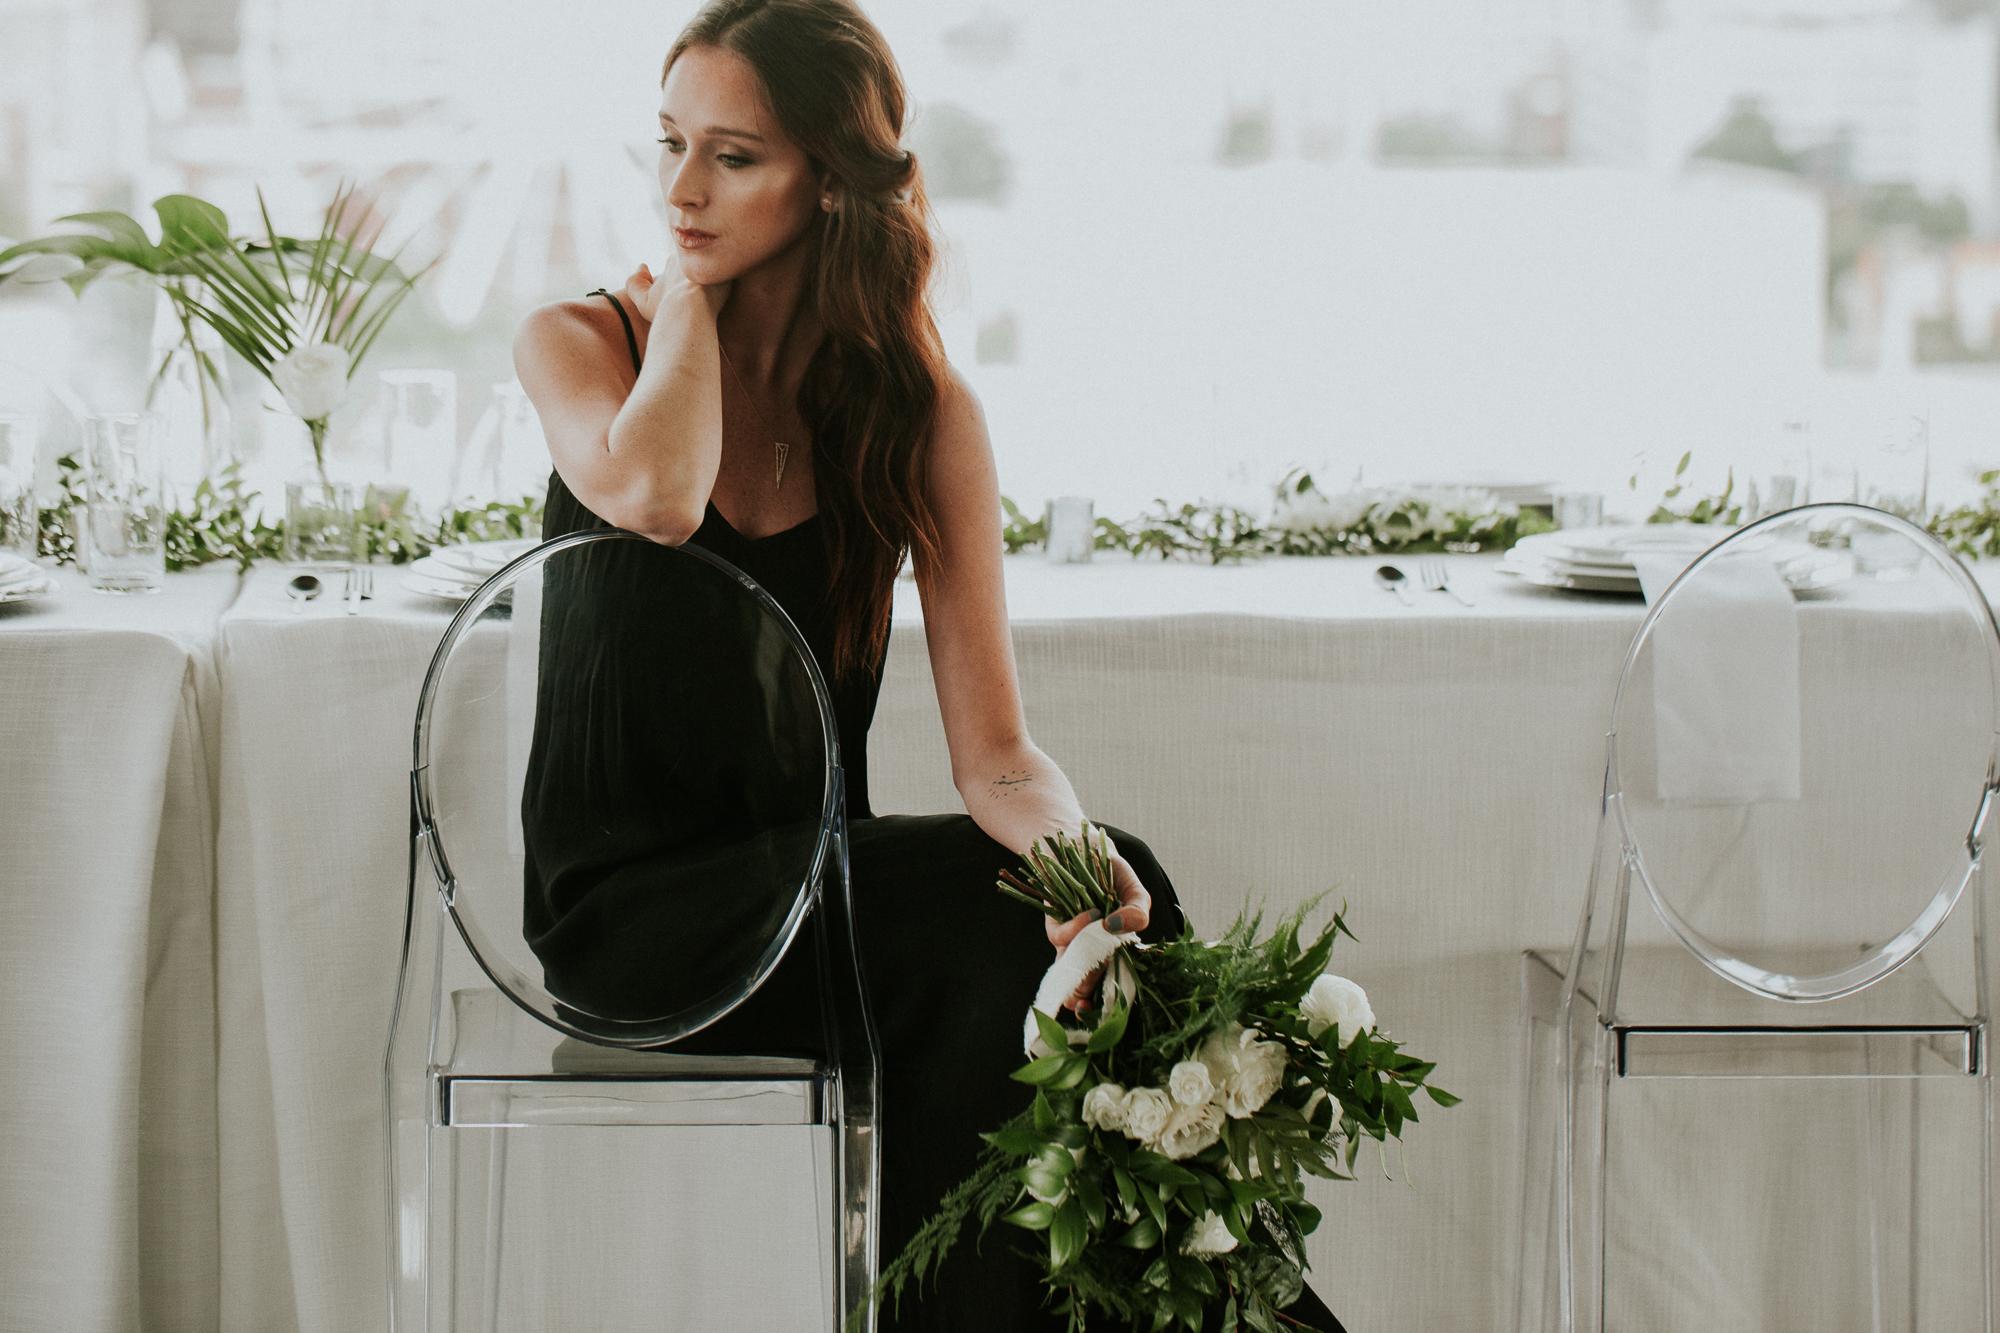 julia+franks+photography+luxury+portraits+wedding+lifestyle+080116-41.jpg